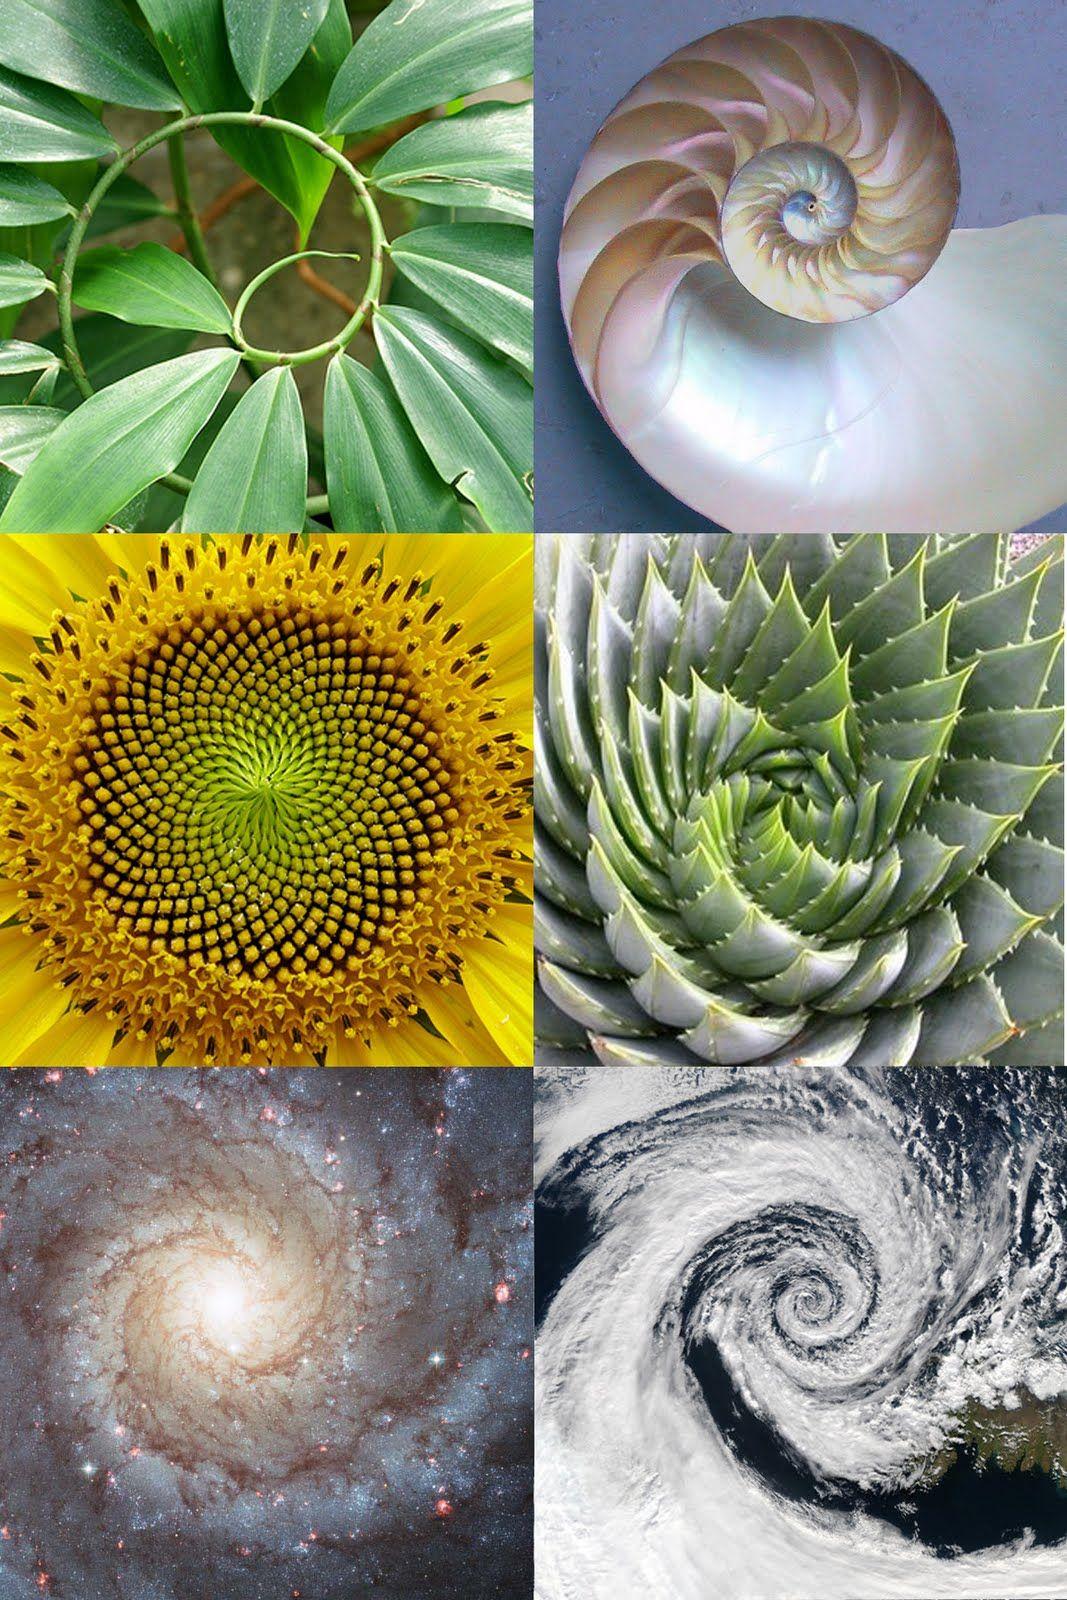 Golden Spiral A Special Spiral Drawn Inside Of A Golden Rectangle